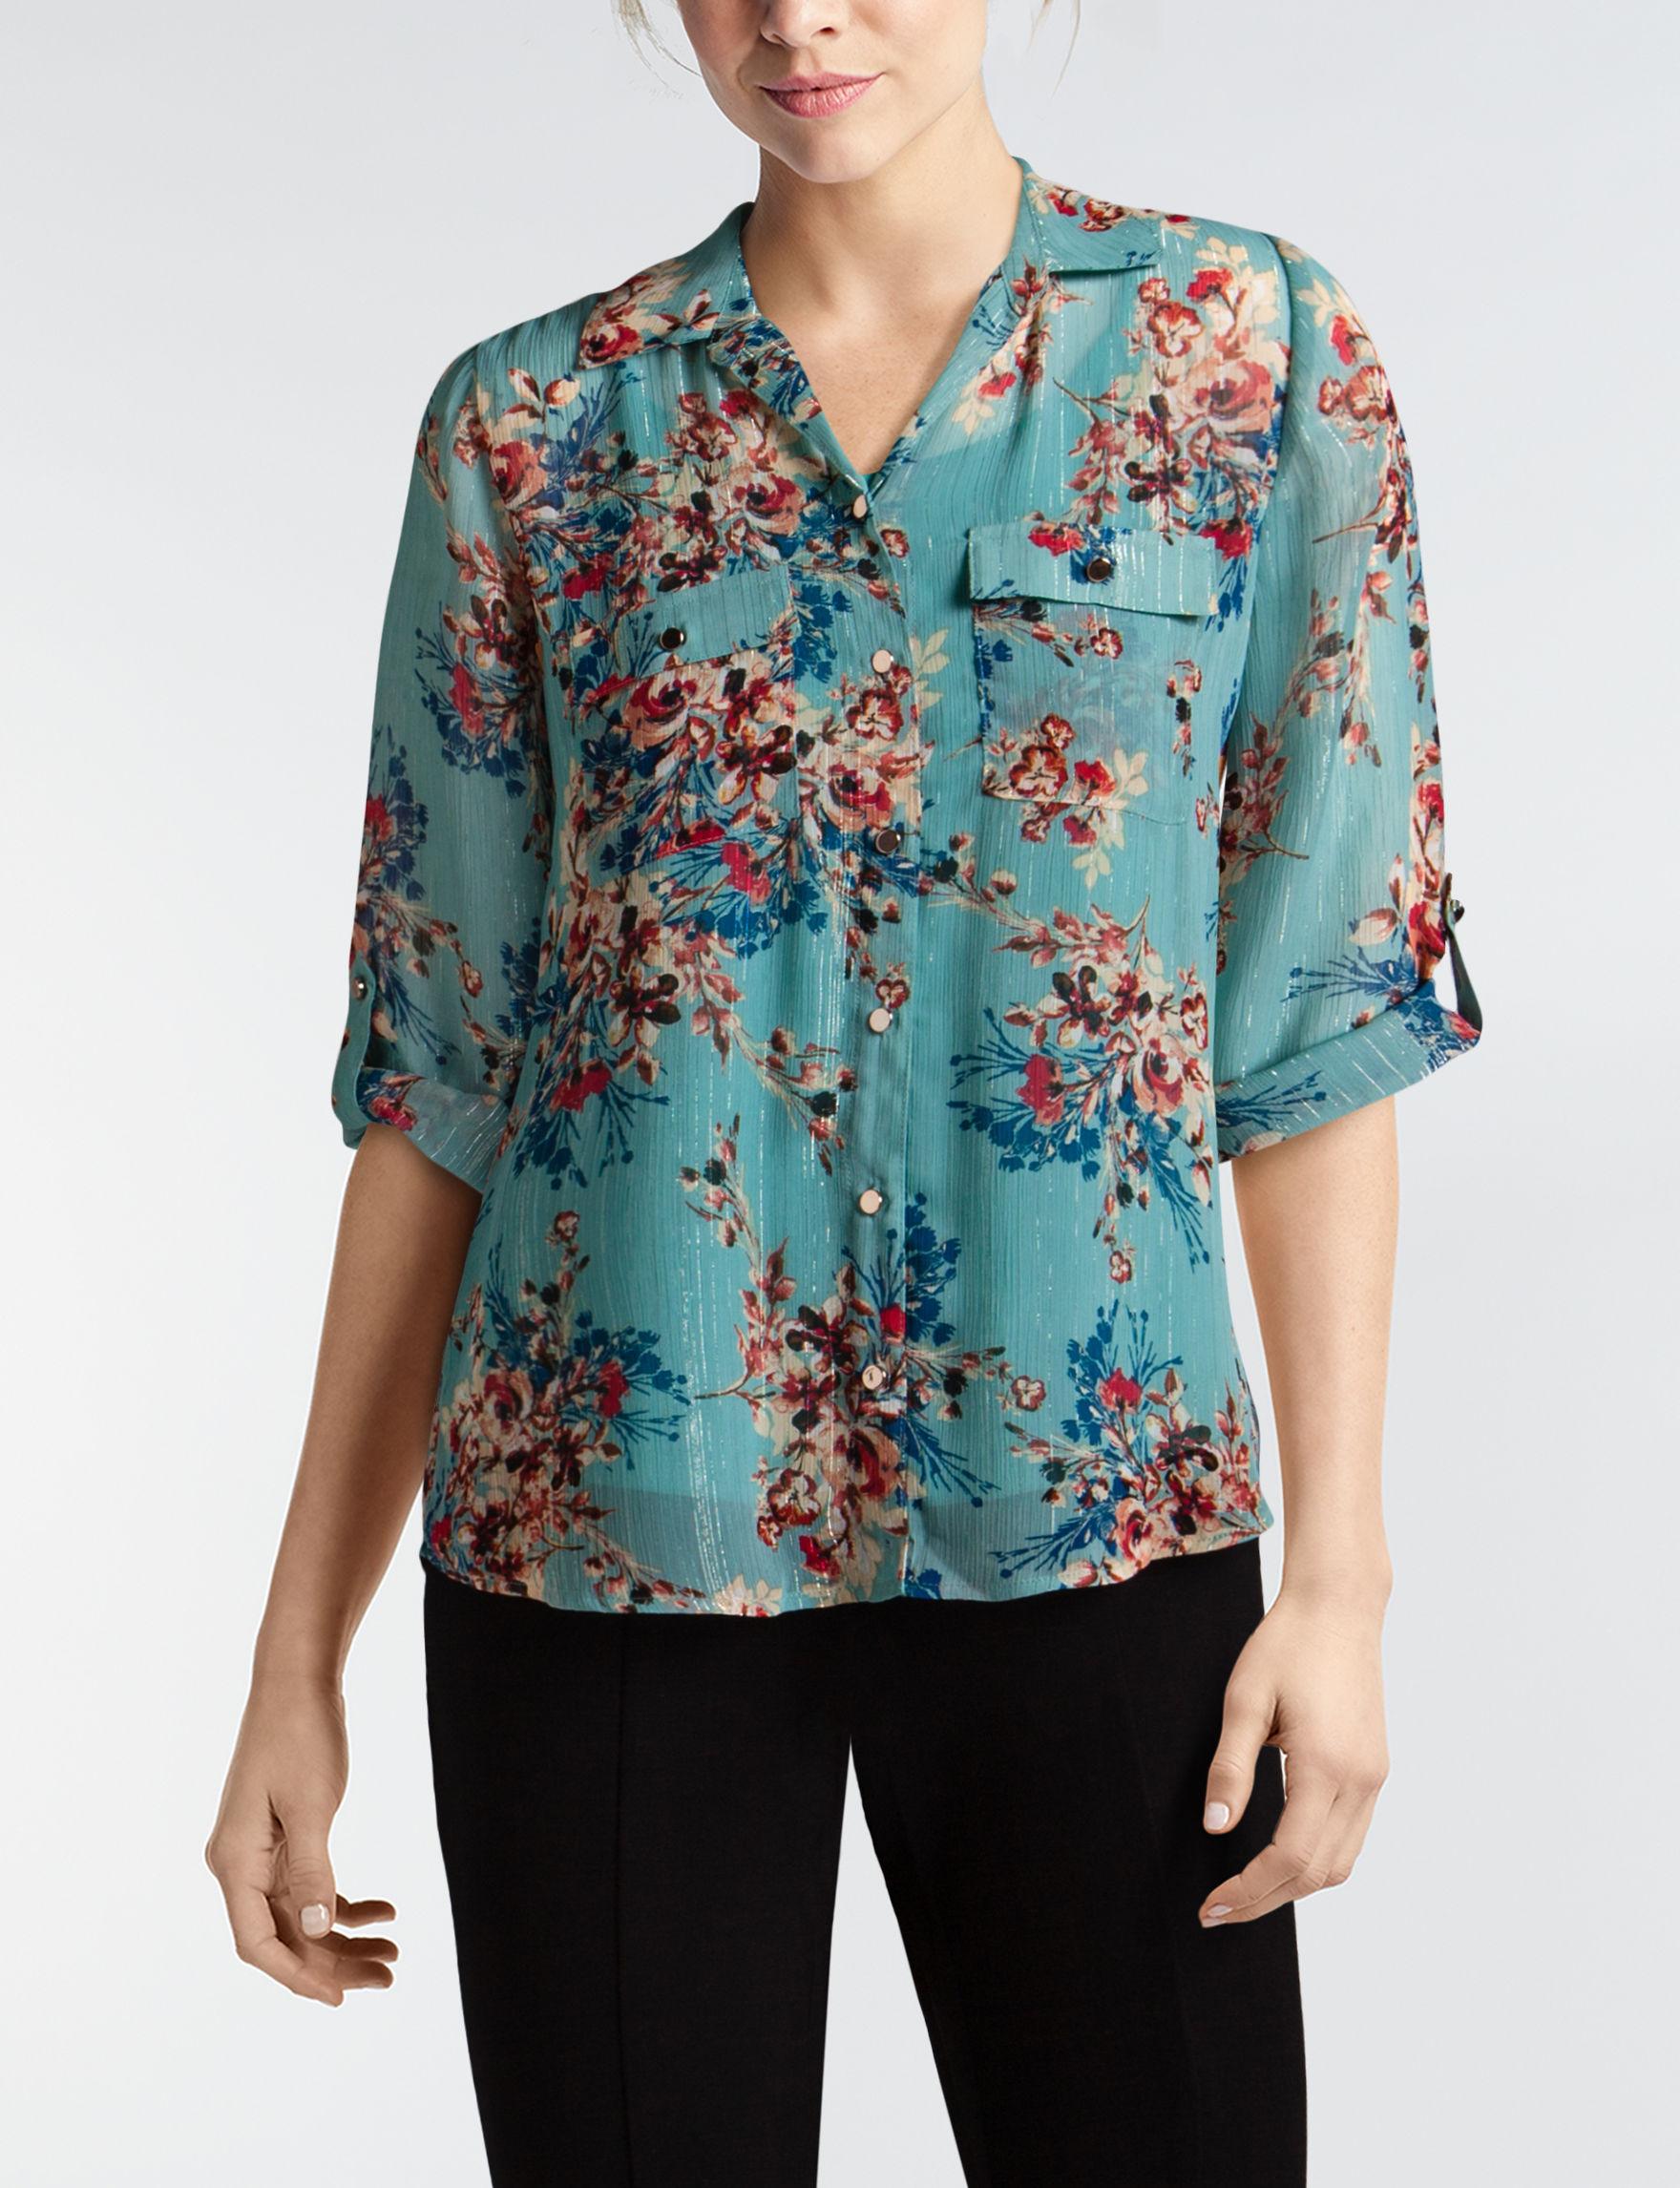 Sara Michelle Blue Floral Shirts & Blouses